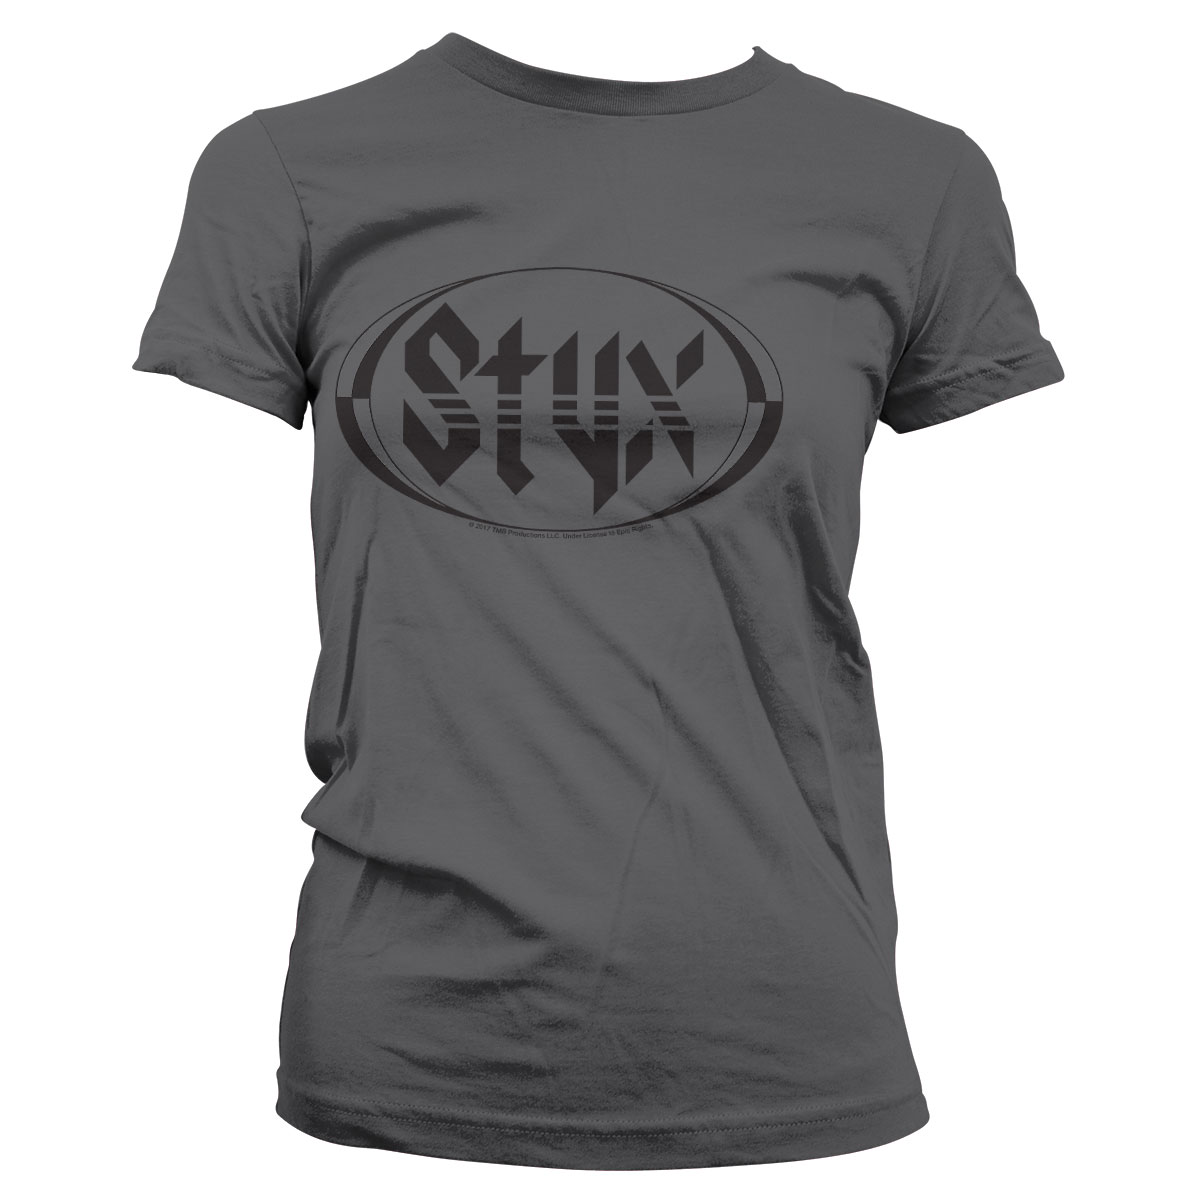 Styx Logo Girly Tee